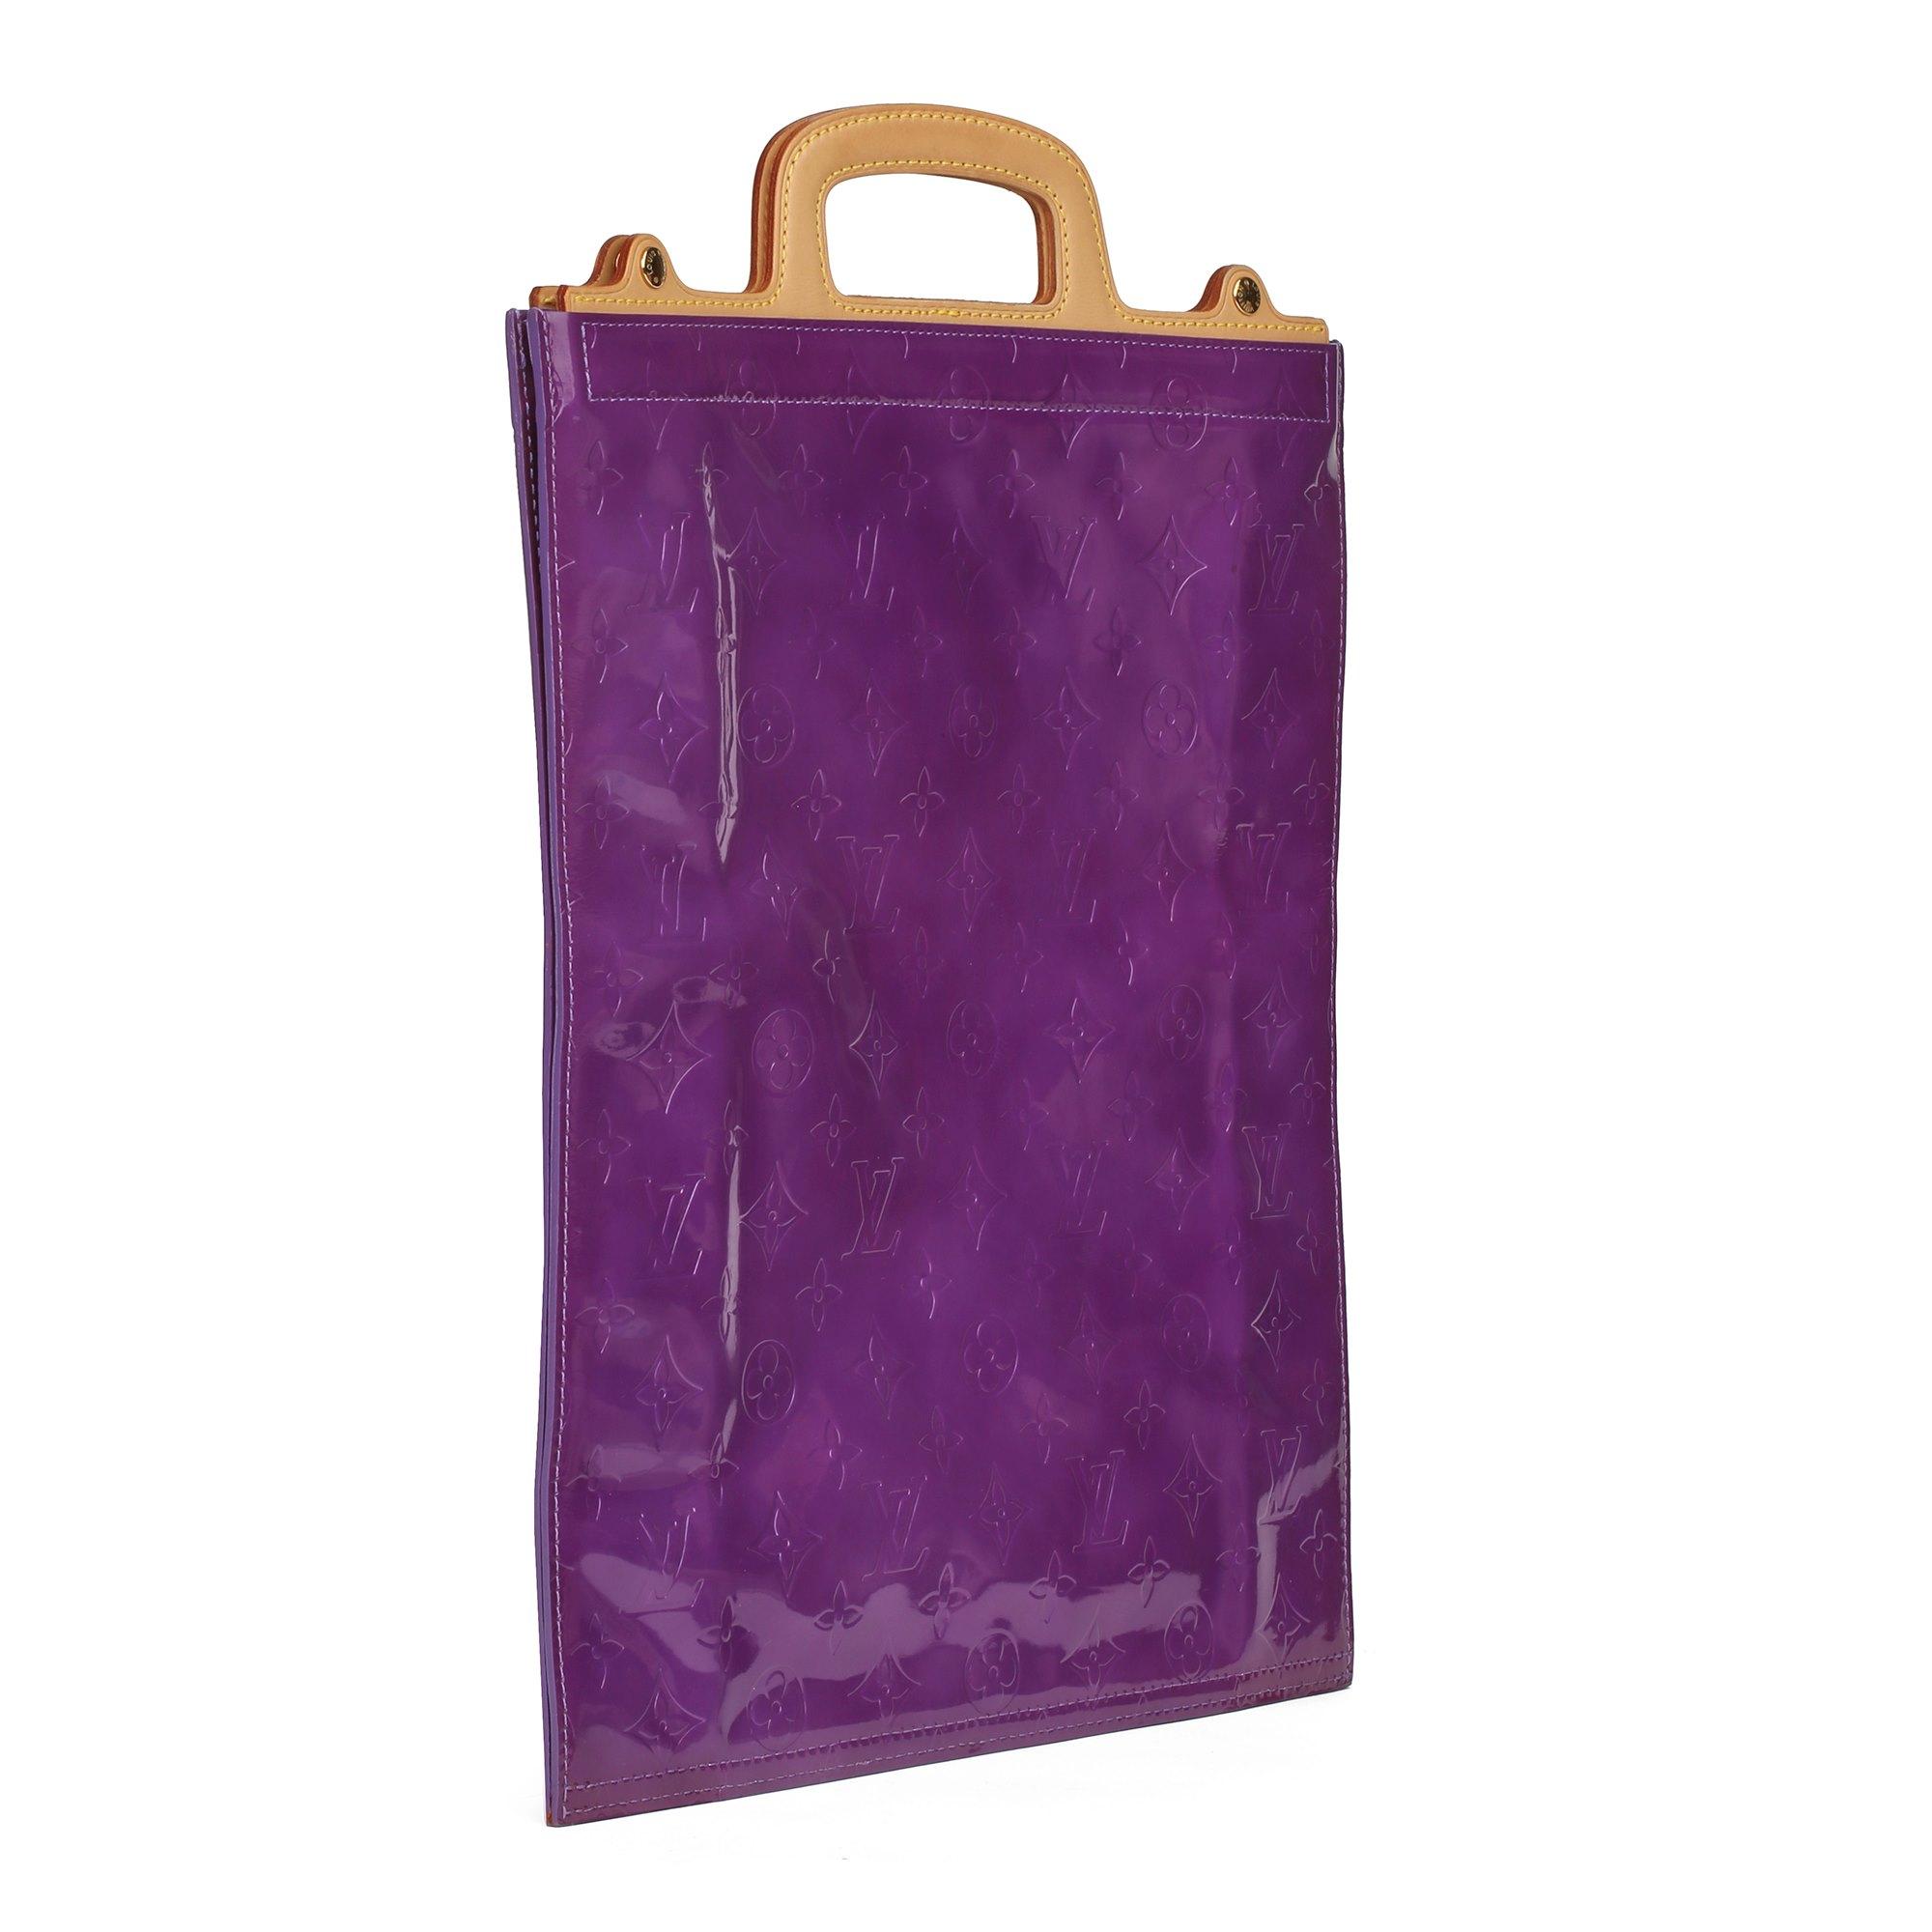 Louis Vuitton Purple Monogram Vernis Leather & Vachetta Leather Vintage Stanton